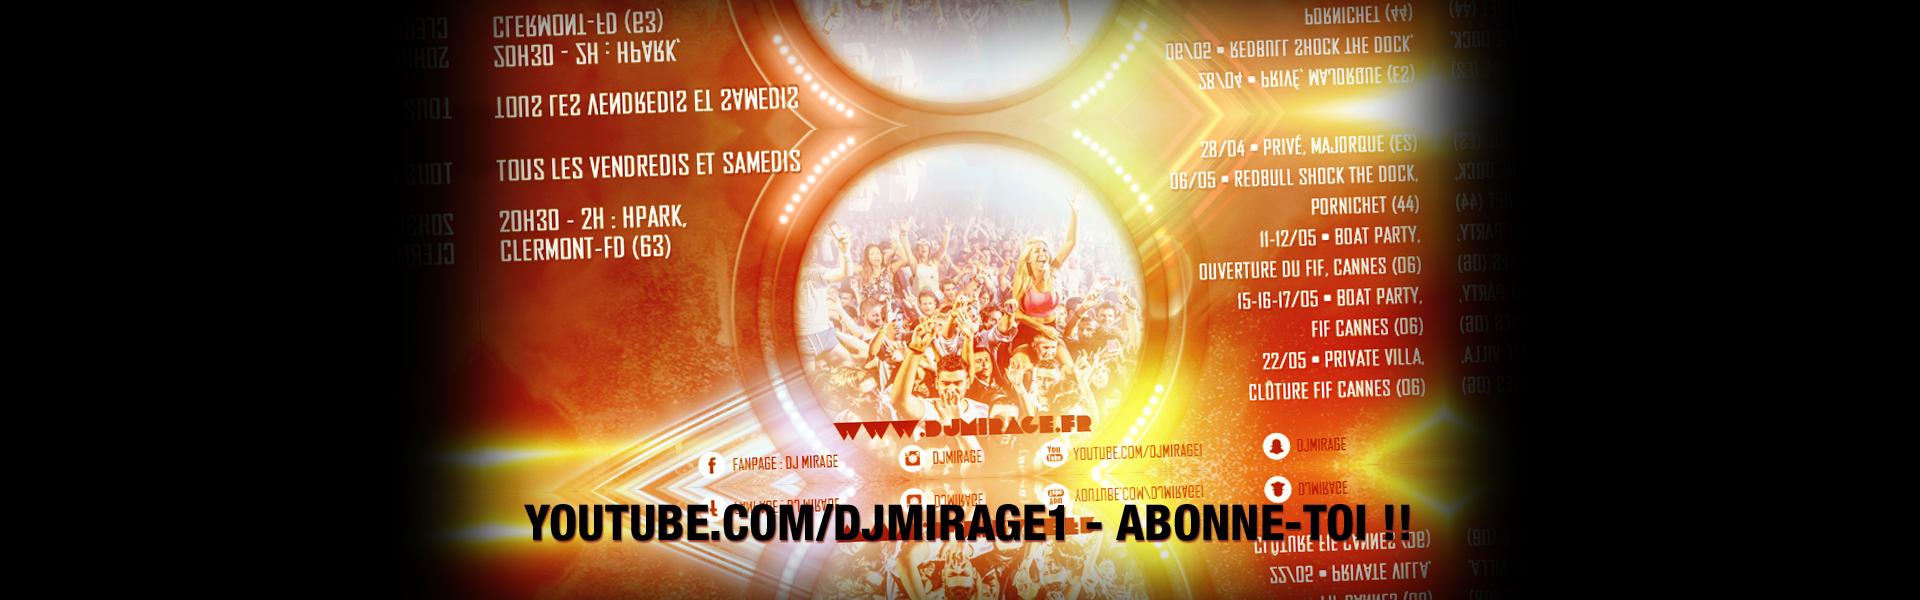 http://djmirage.fr/wp-content/uploads/2015/12/slider-accueil-deejaymirage-mai16.jpg